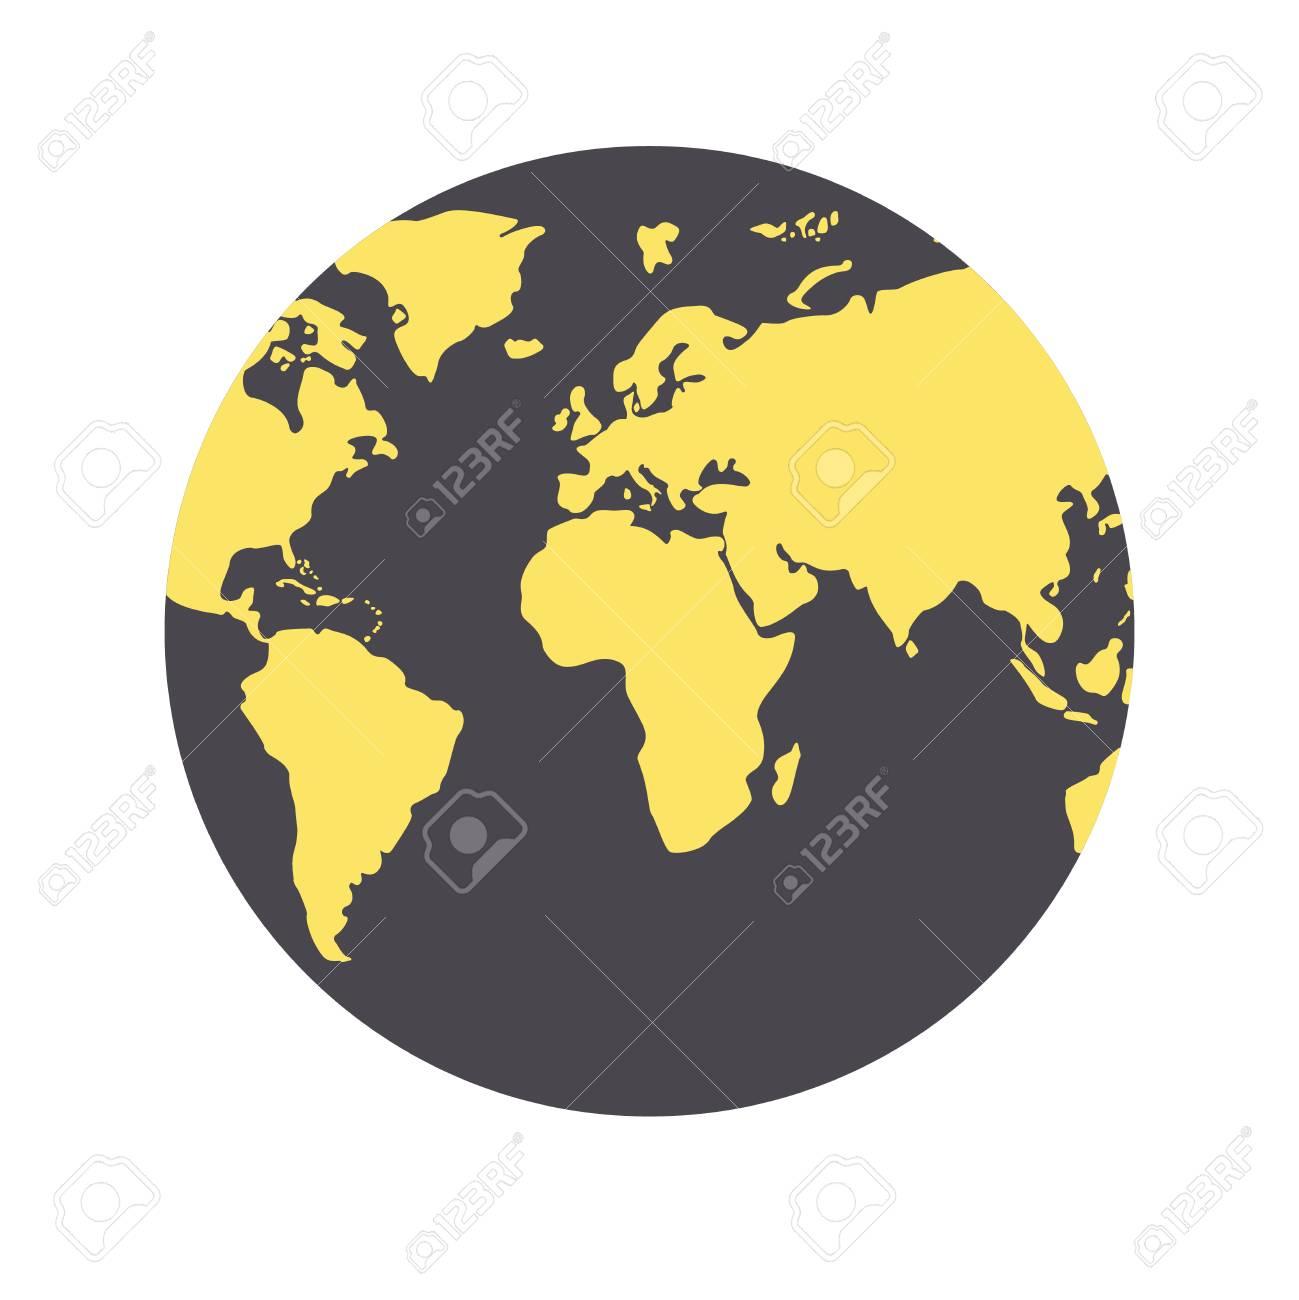 vector world map globe made of circle shapes black and yellow